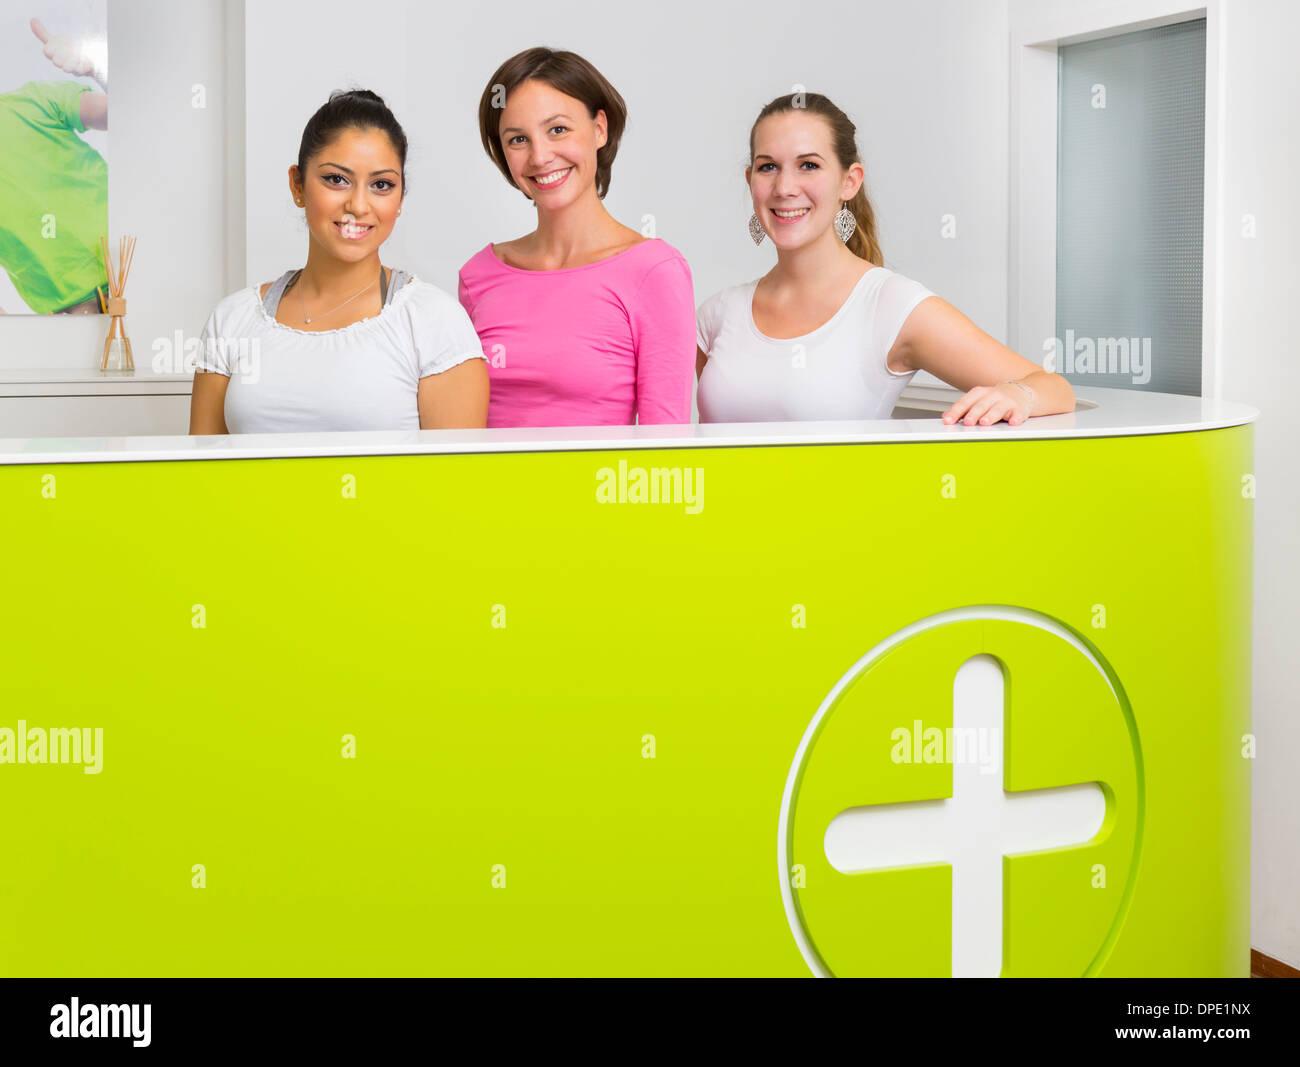 Three female receptionists at desk - Stock Image